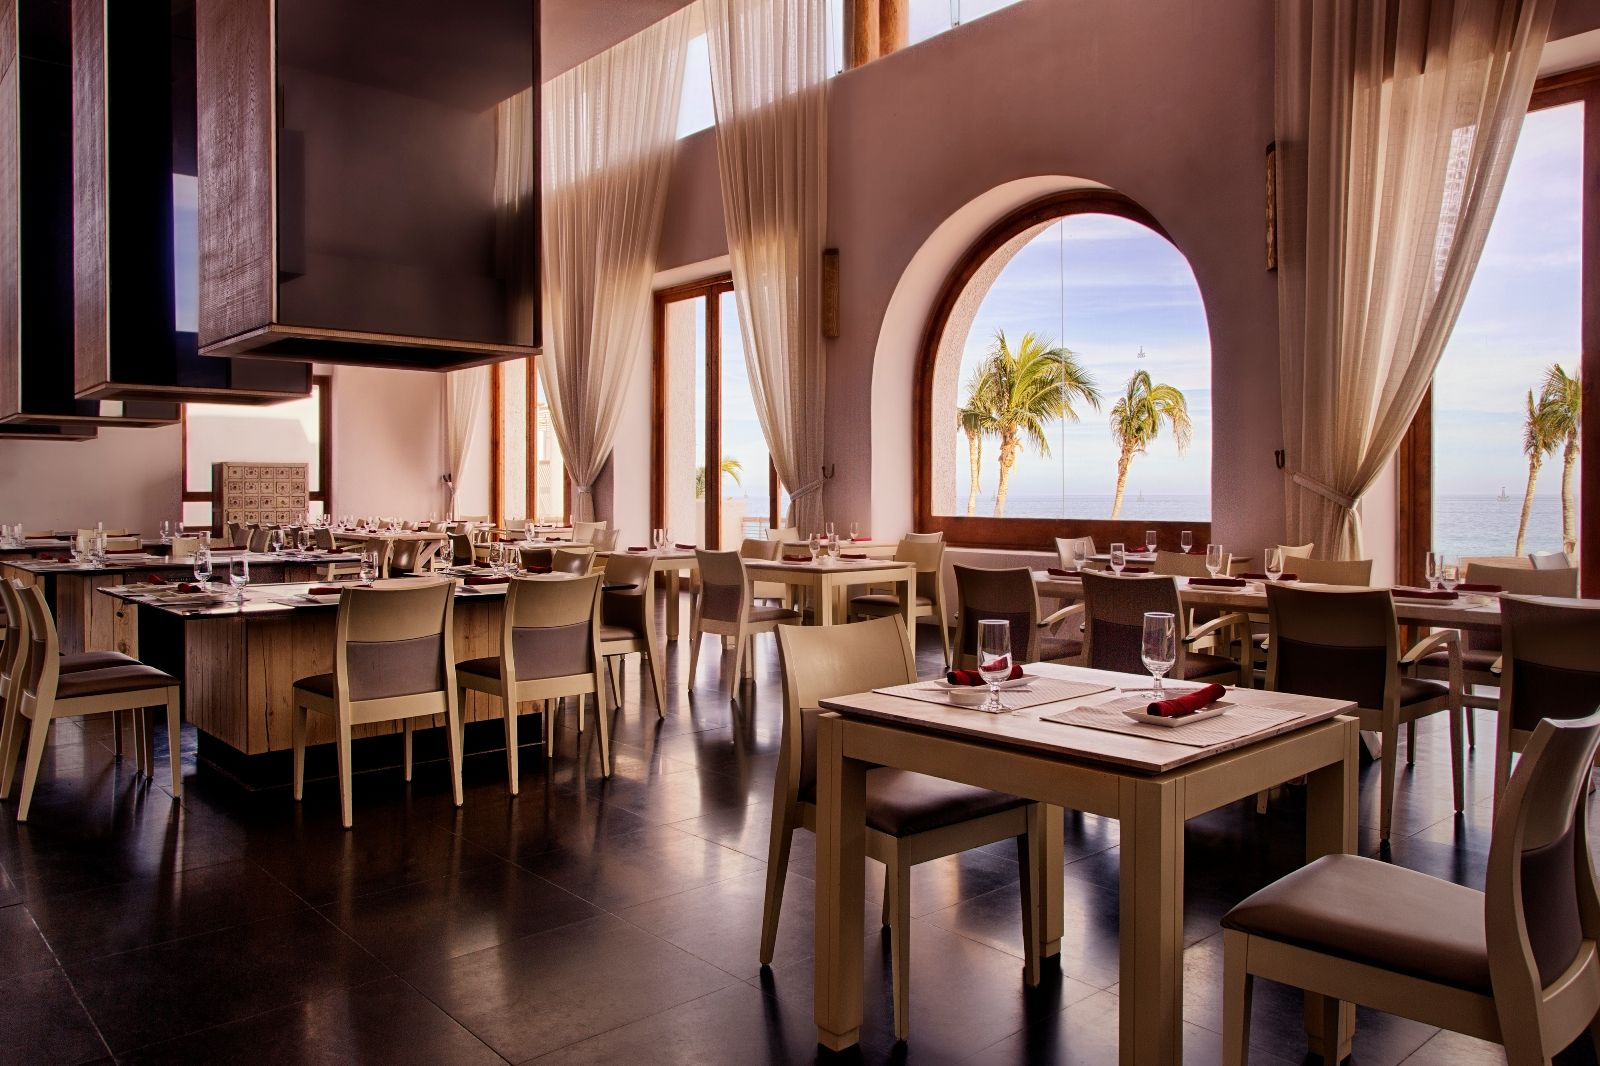 Sakee dining room and teppanyaki tables